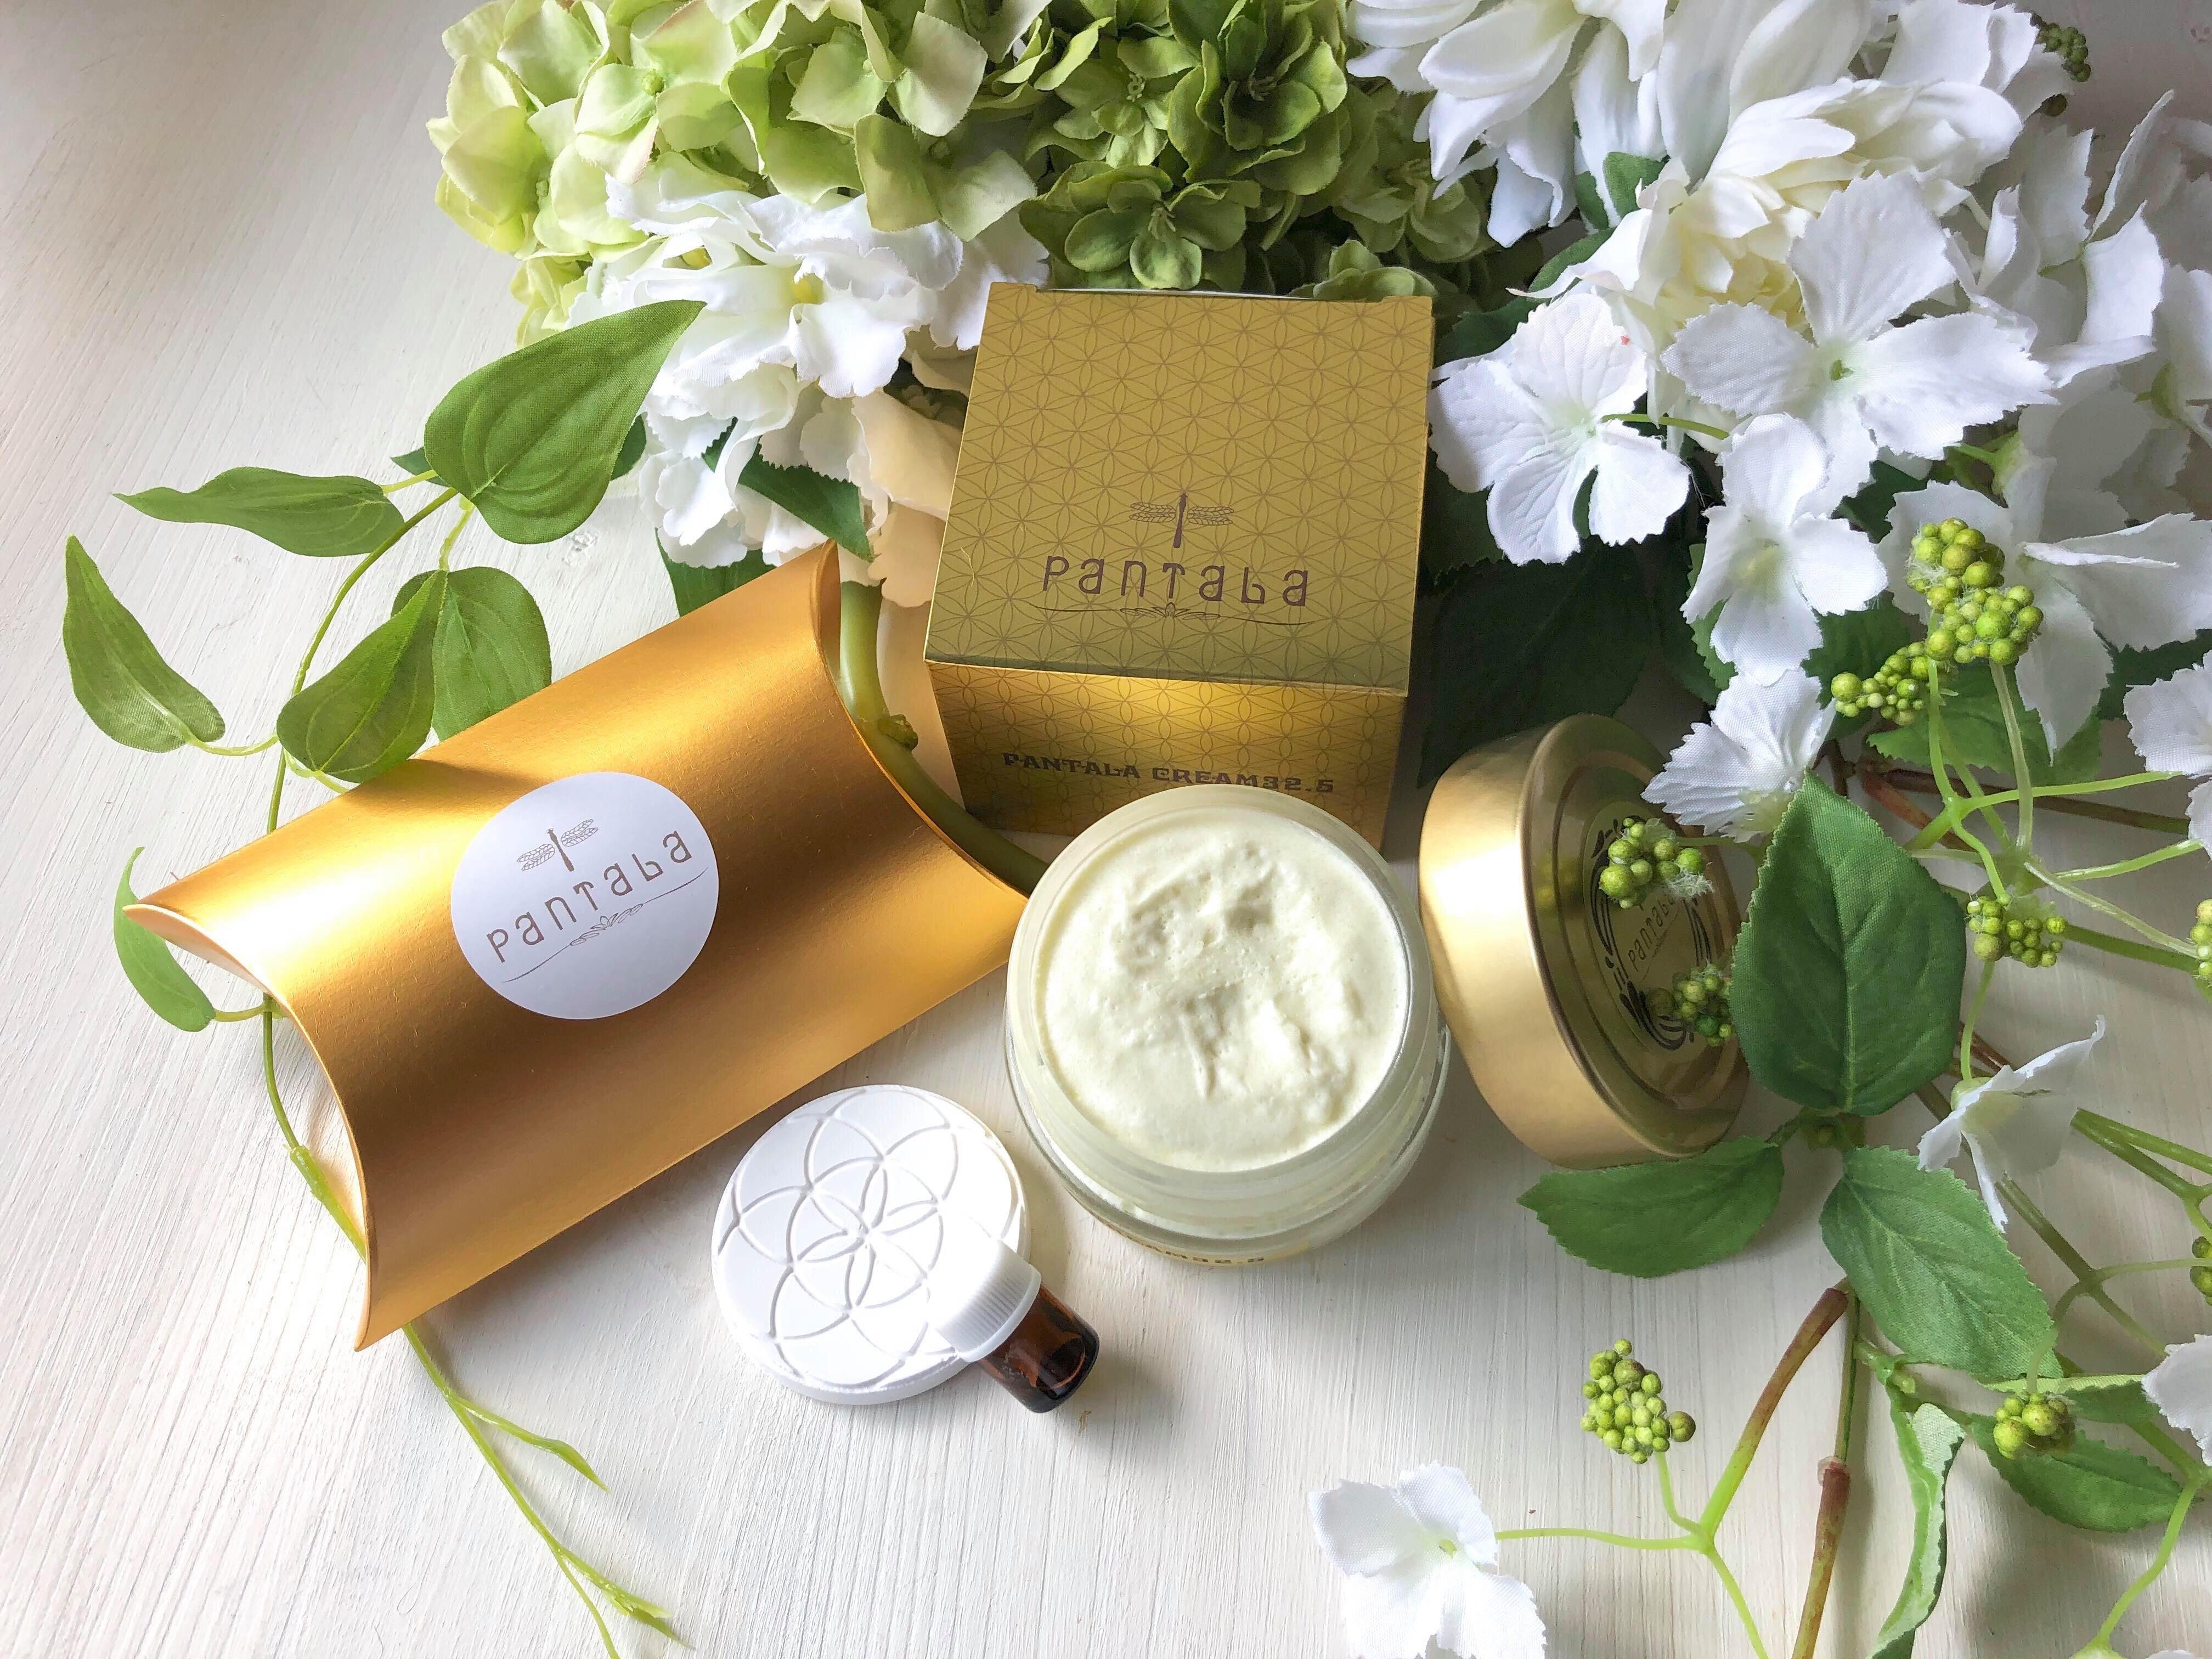 PANTALAクリームとお花のコラボ